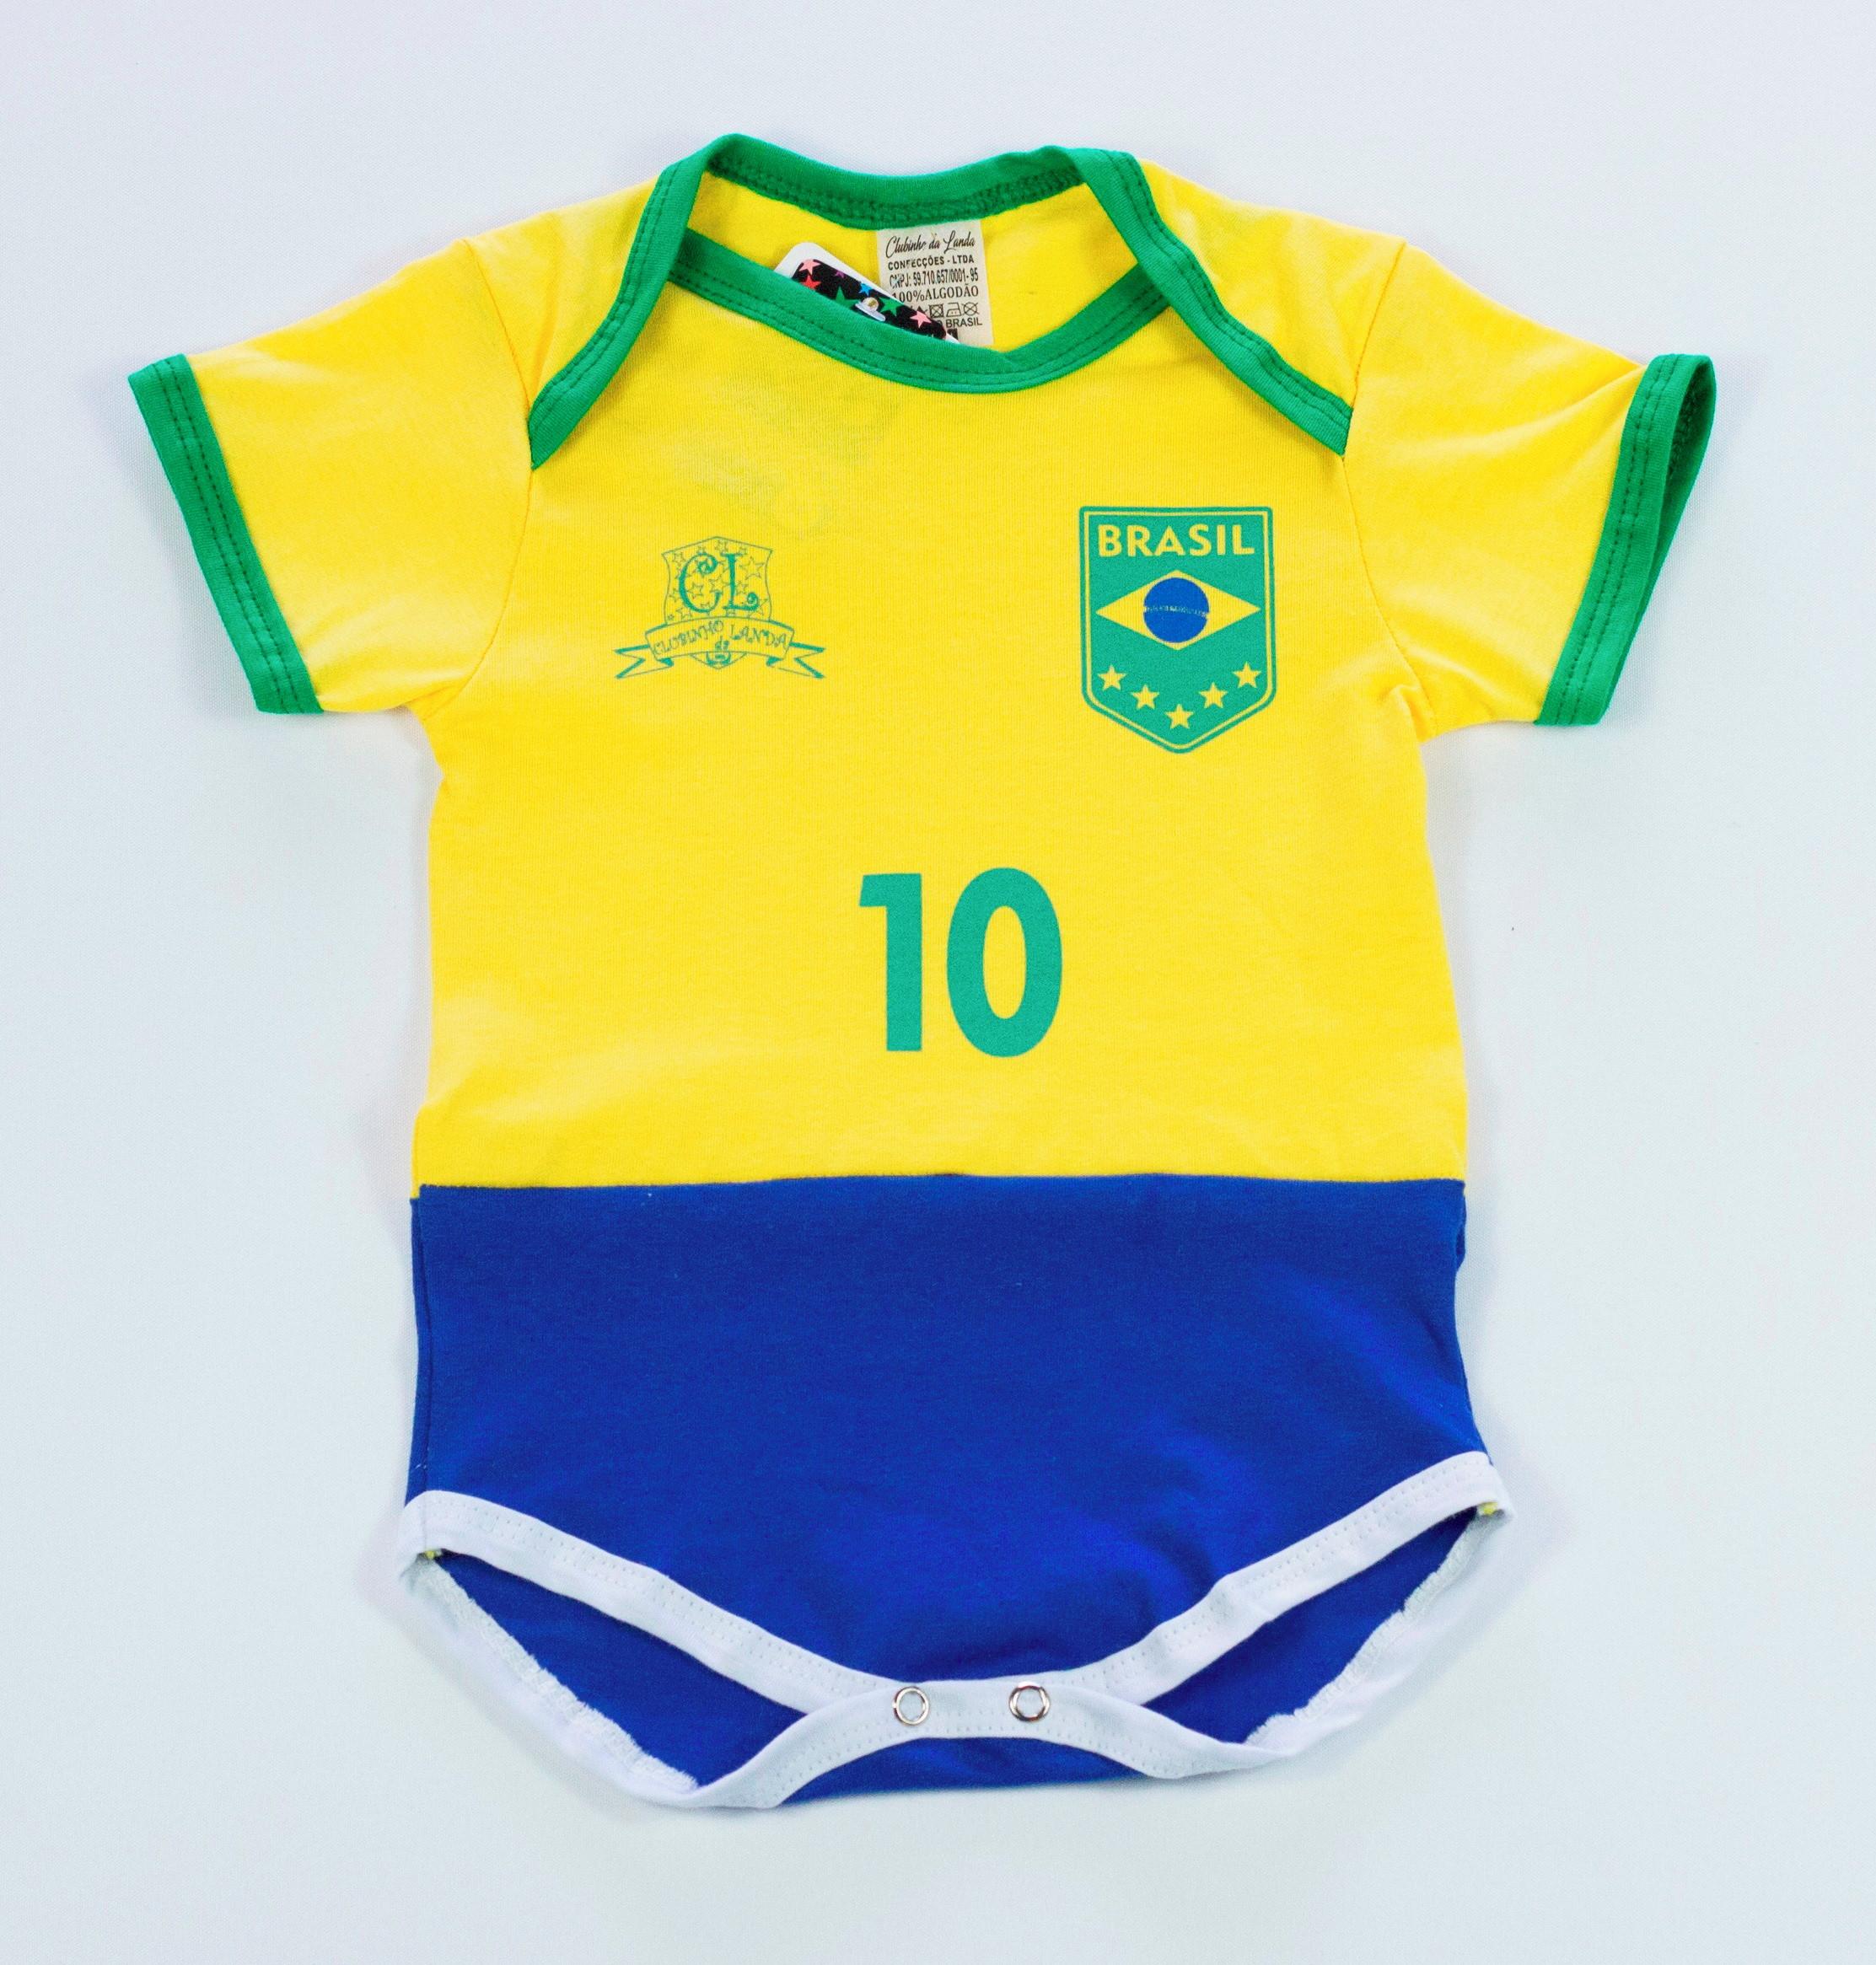 4764f91562 Body Tip Top Bebê Enxoval Brasil Time Futebol Seleção no Elo7 ...